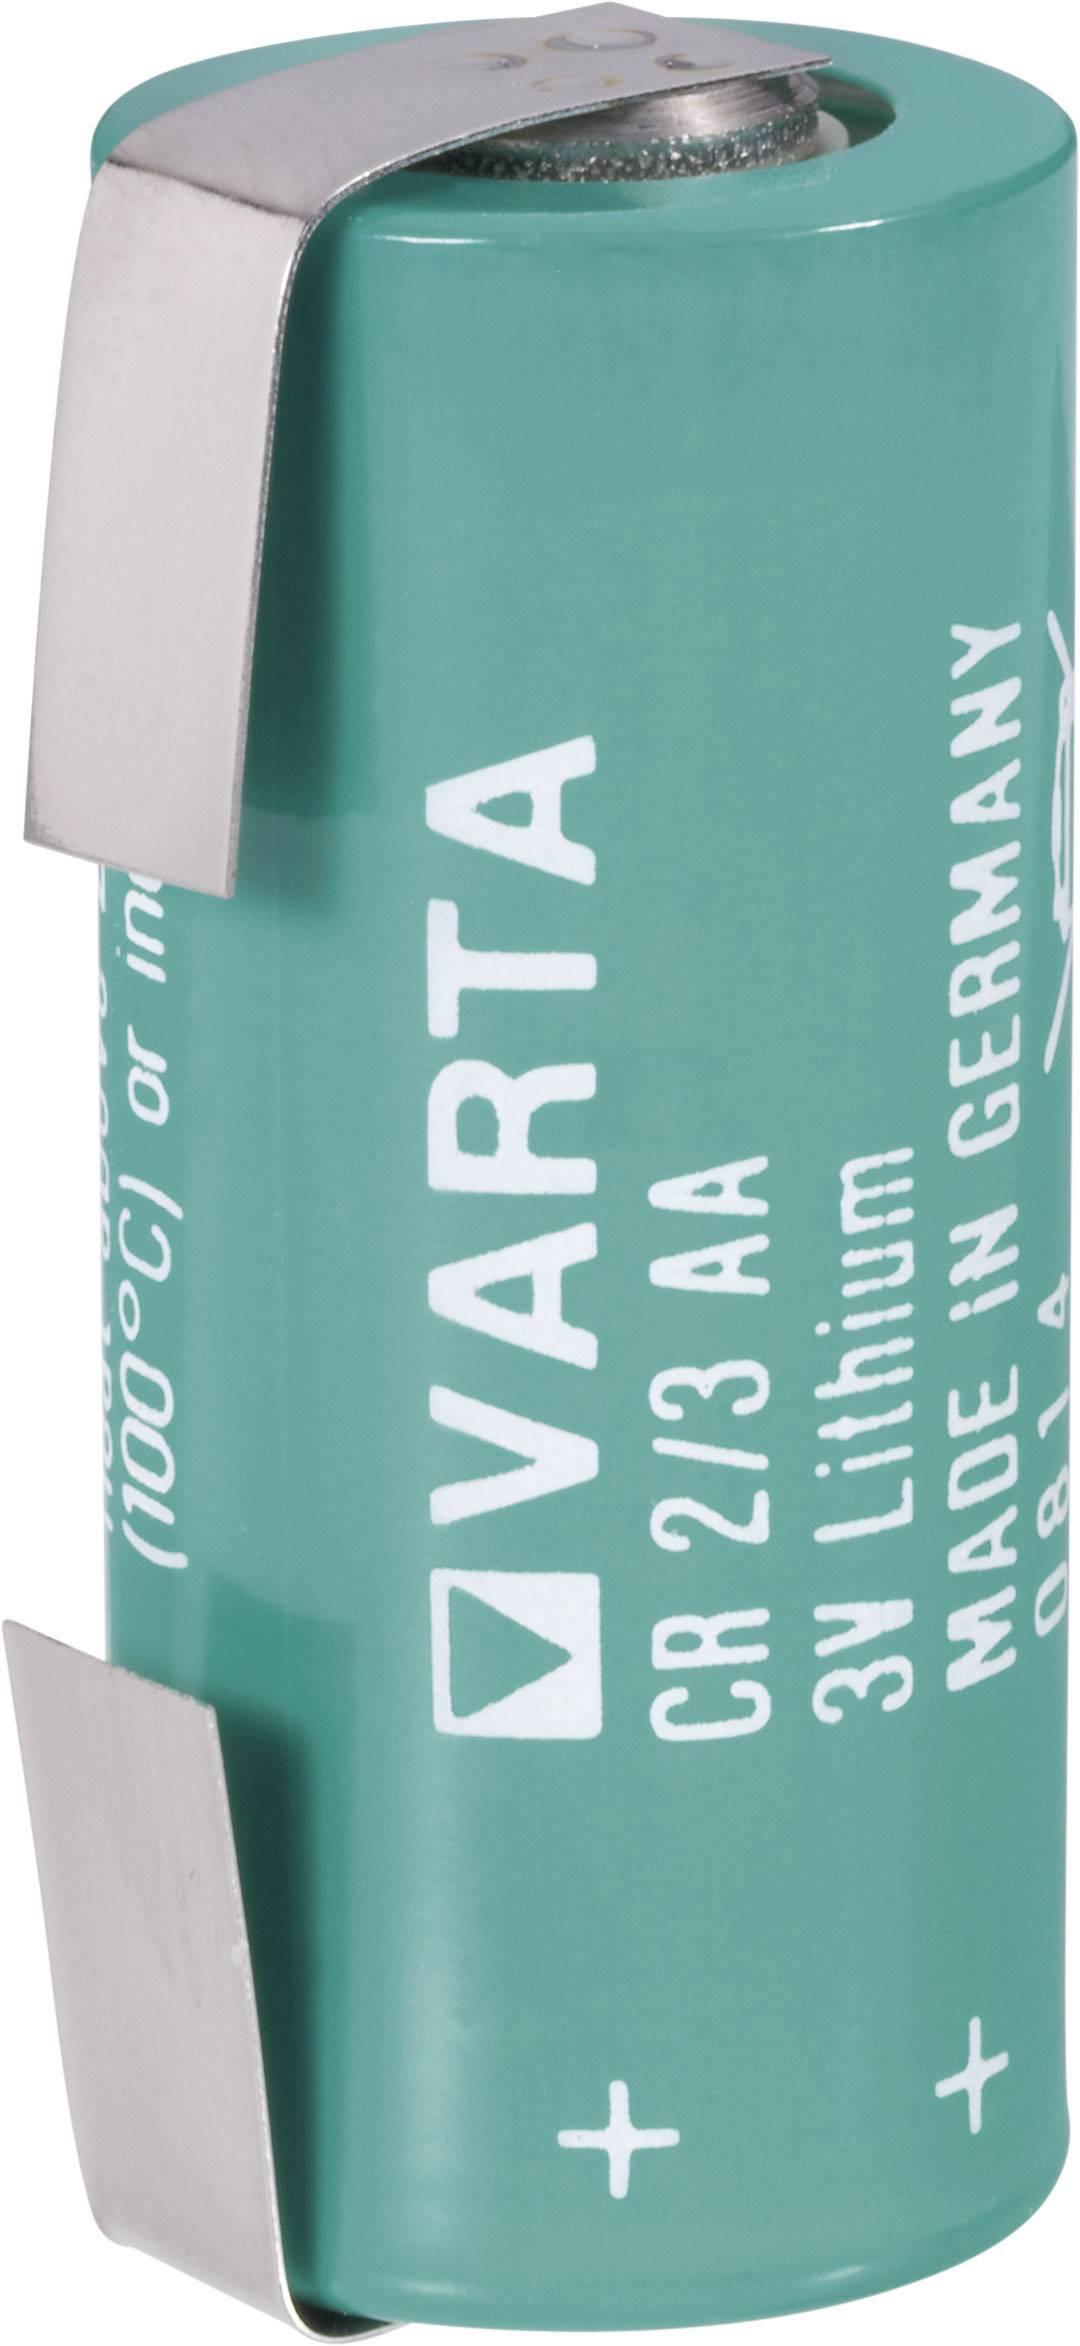 Špeciálny typ batérie CR 2/3 AA LF lítium, Varta CR2/3 LF, 1350 mAh, 3 V, 1 ks